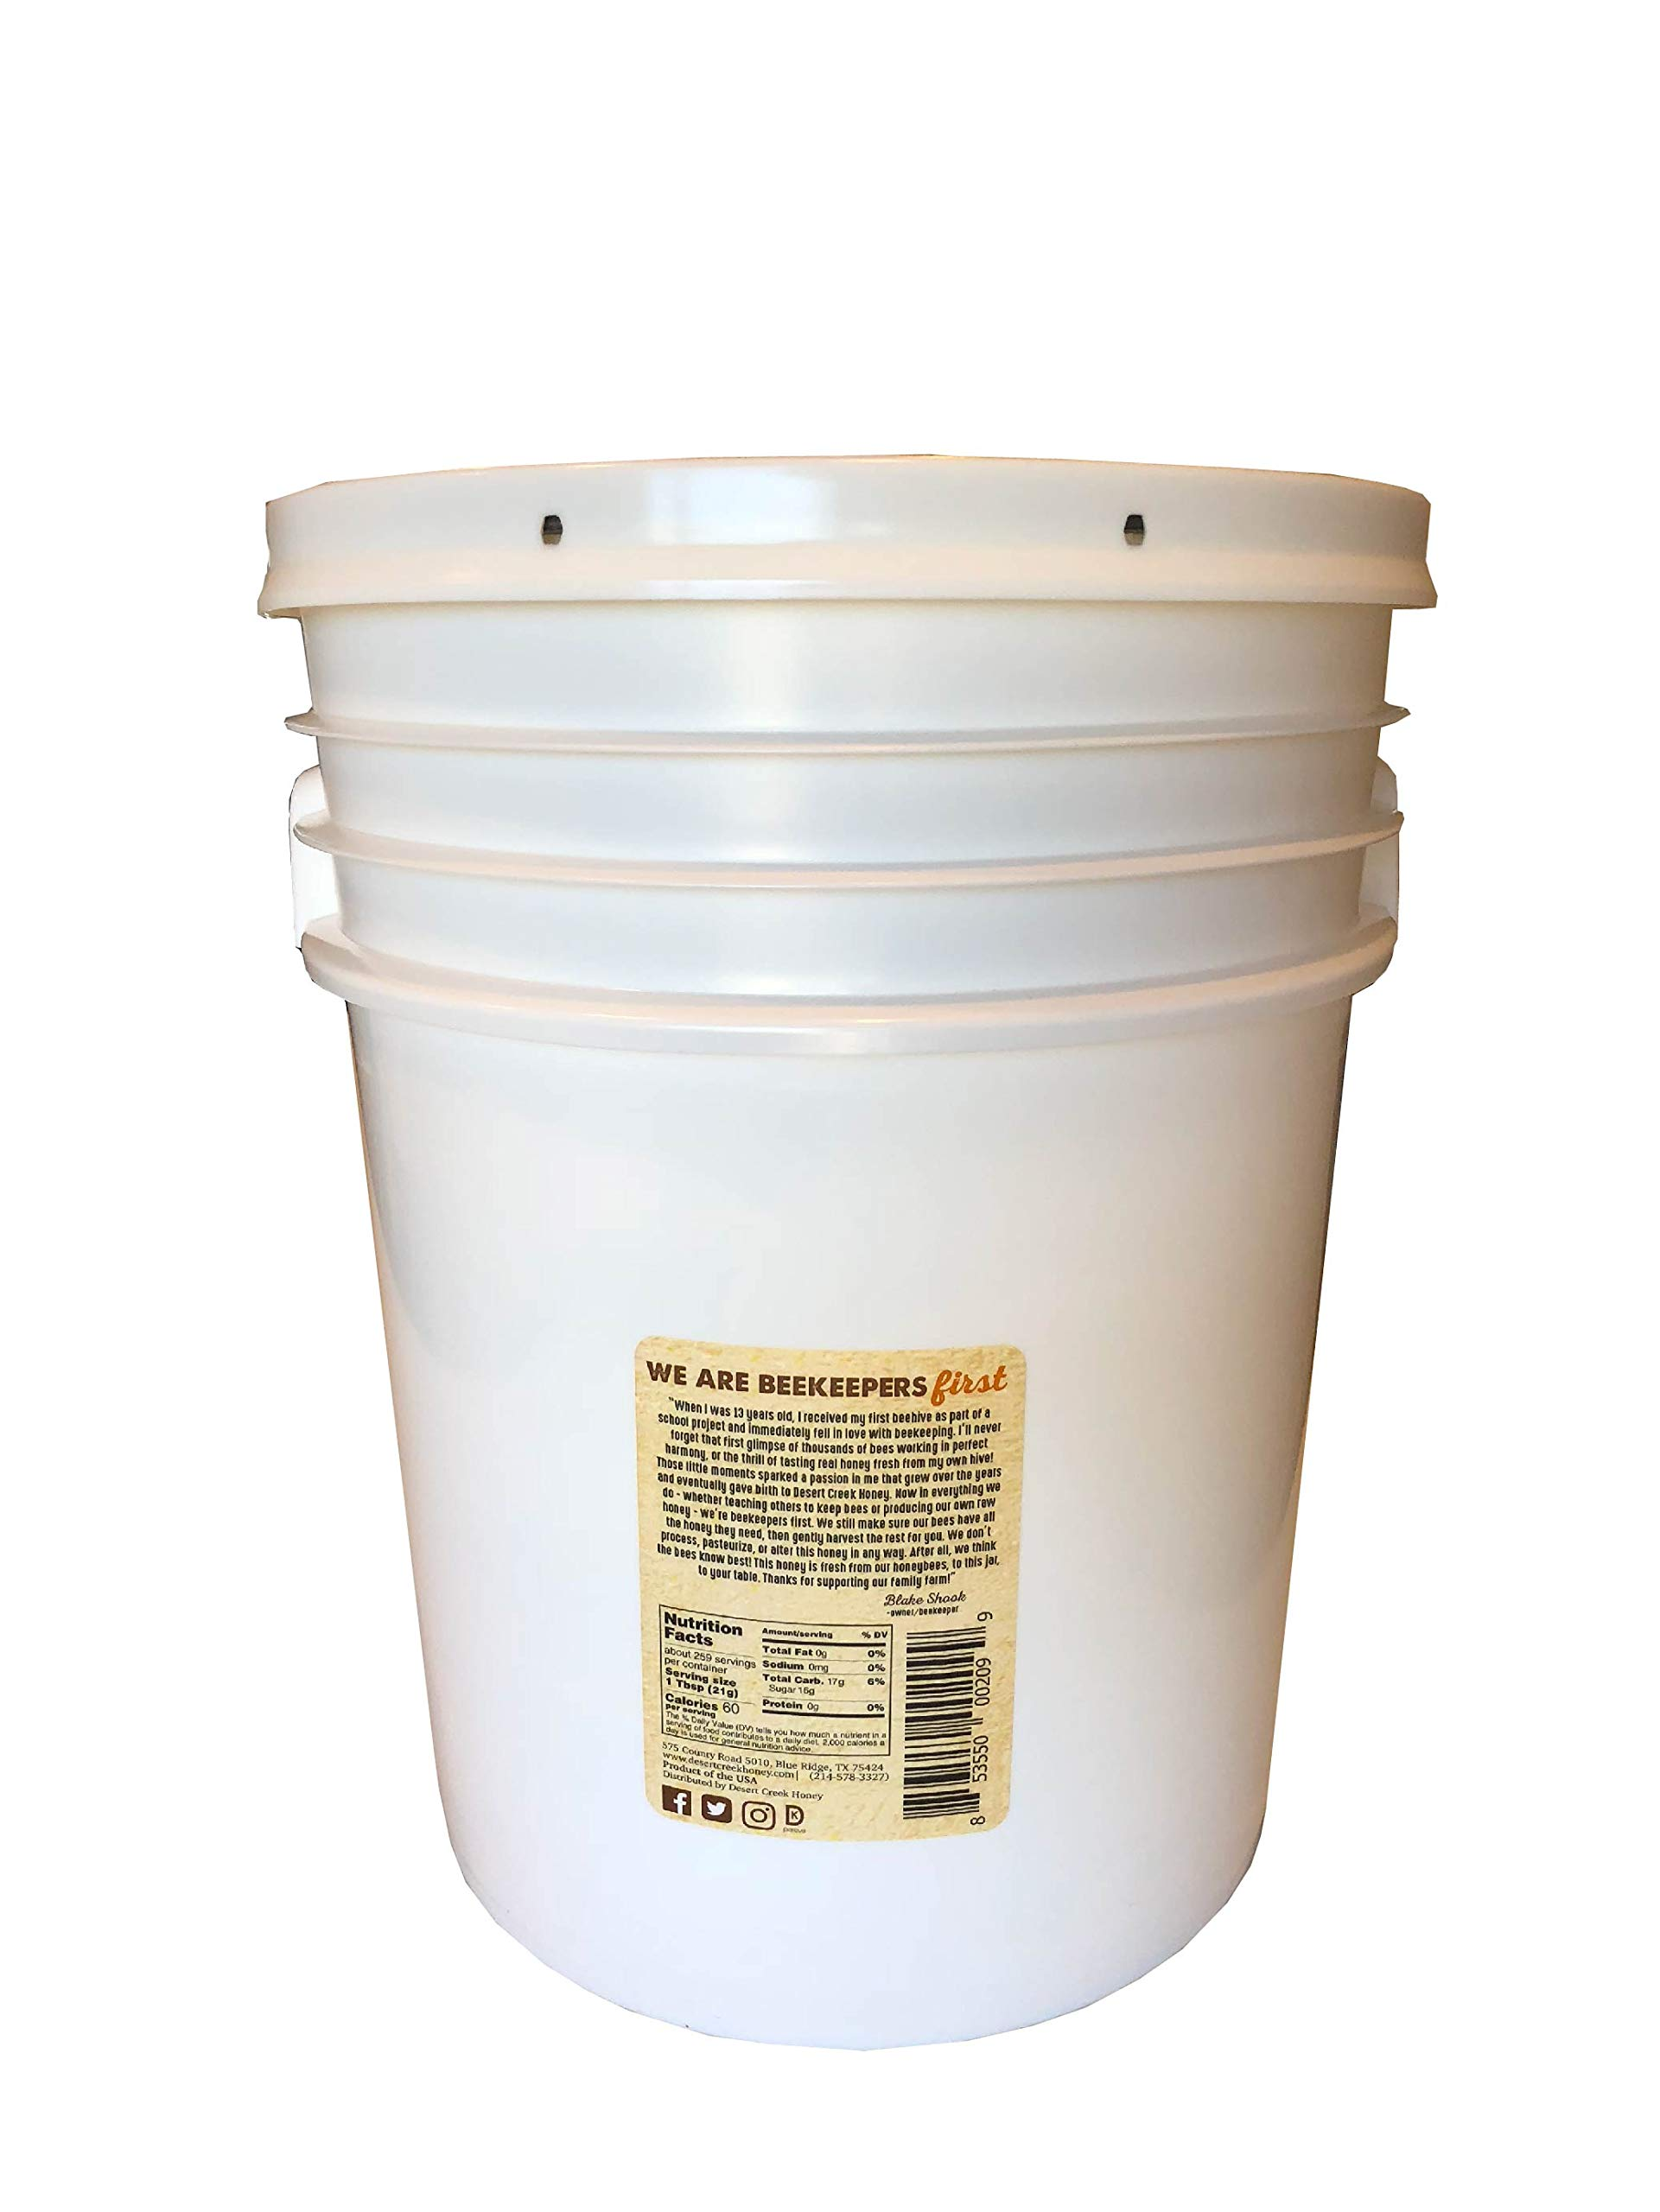 Raw, Unfiltered, Unpasteurized Texas Honey by Desert Creek Honey 5 Gallon (60 lbs) Bulk Bucket Non-GMO, Kosher by Desert Creek Honey (Image #2)